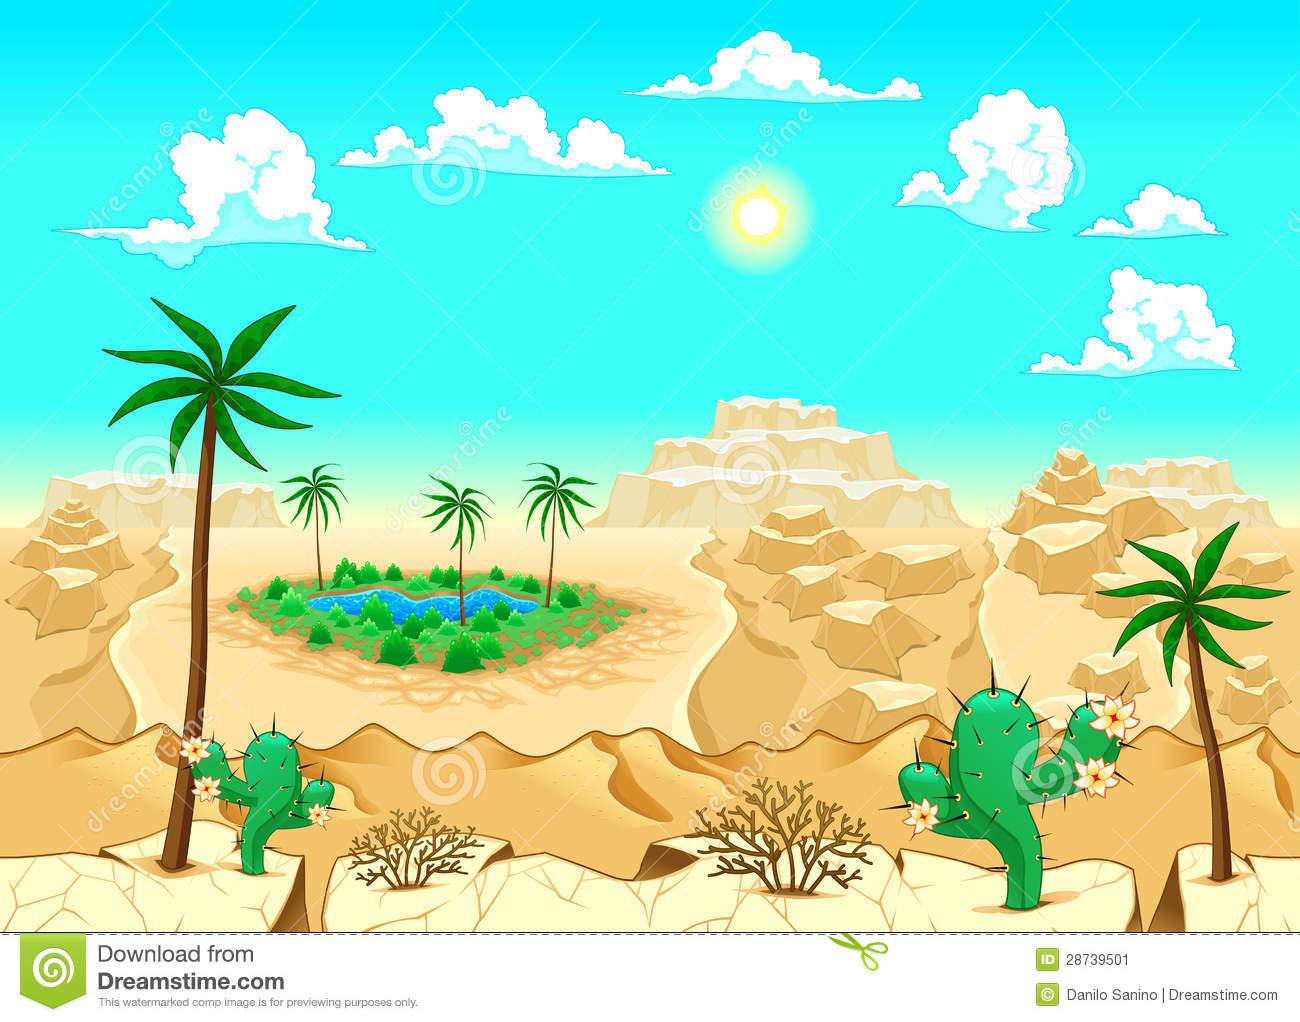 Oase wüste clipart.